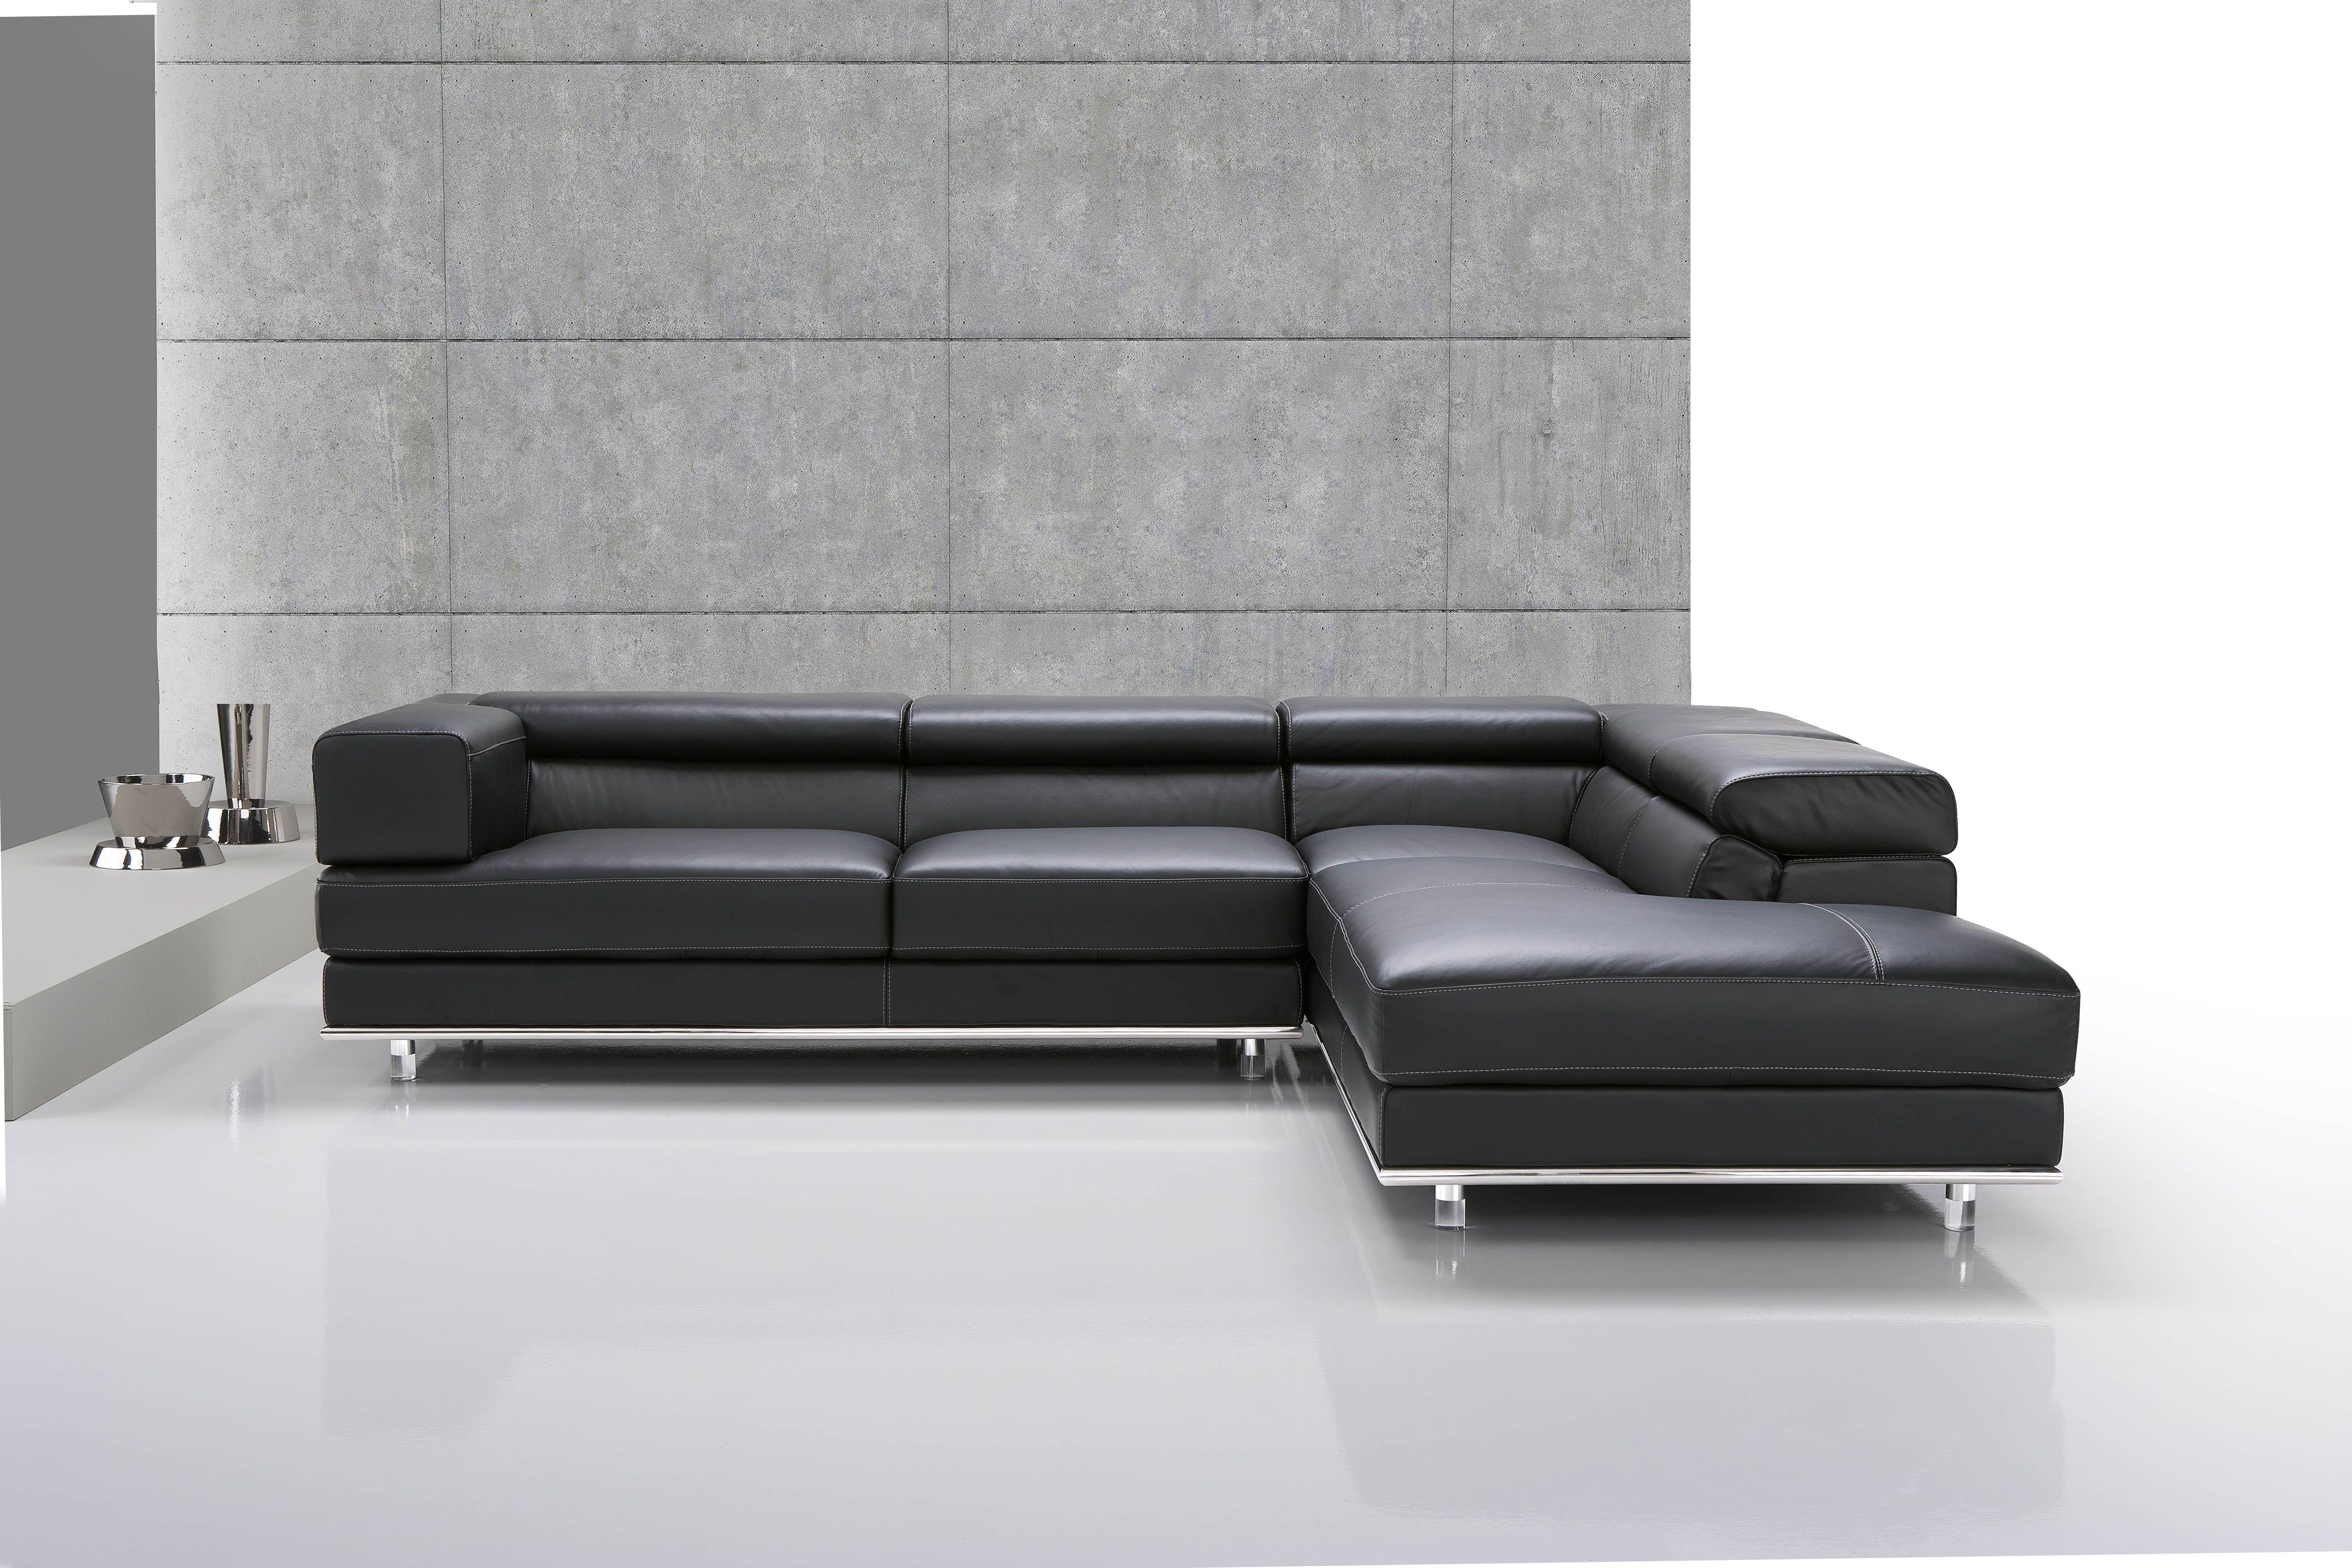 Ecointeriors Ecoexclusive Egoitaliano Couch Italian Design Dublin Santry Dunlaoghaire